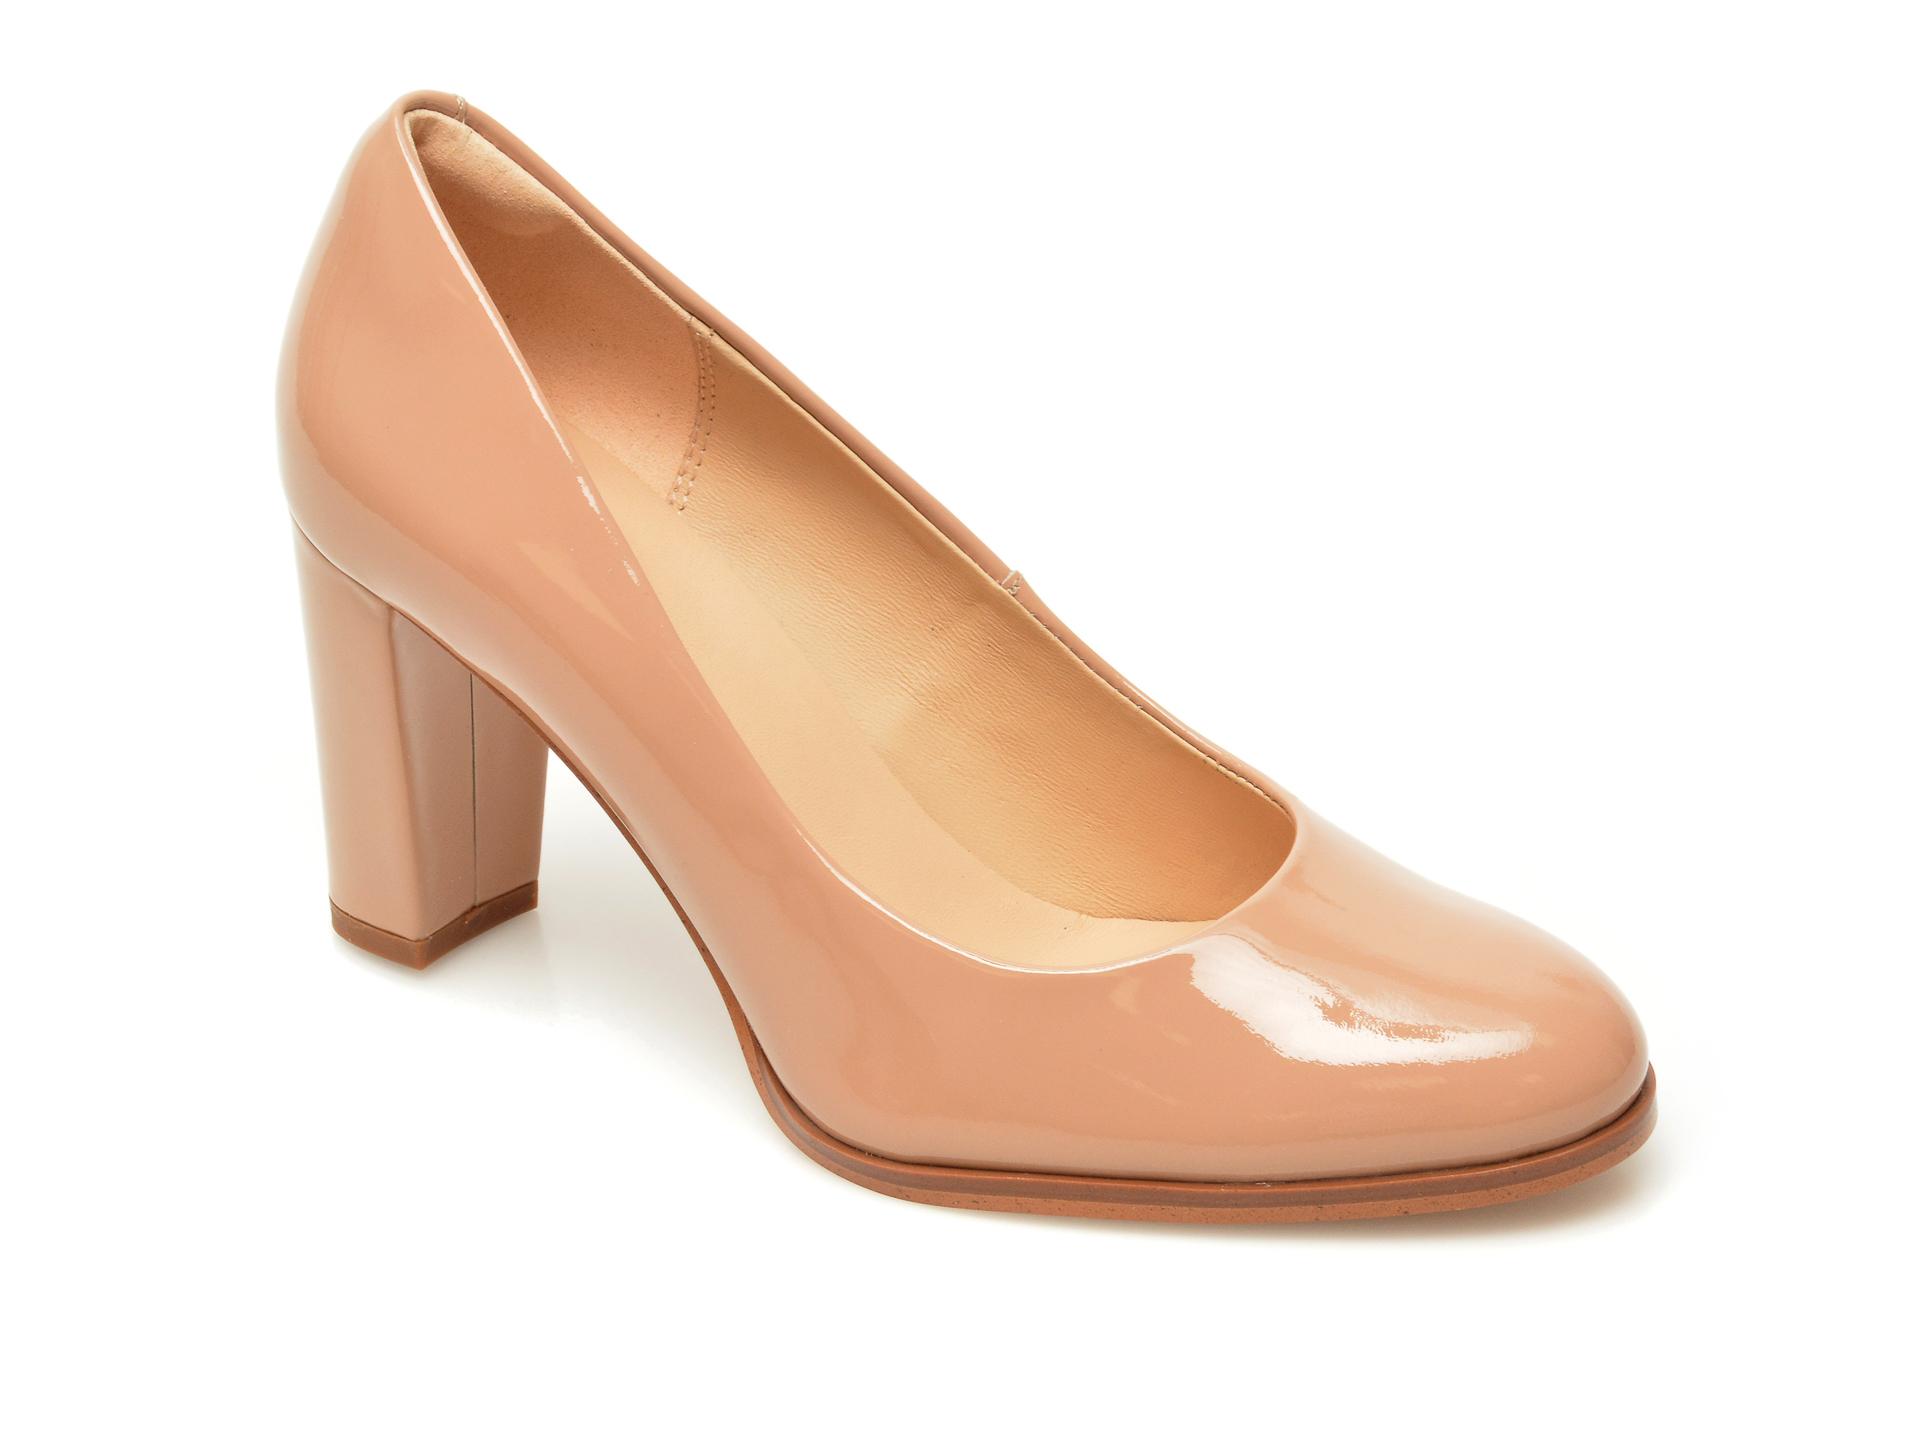 Pantofi CLARKS bej, Kaylin Cara 2, din piele naturala lacuita imagine otter.ro